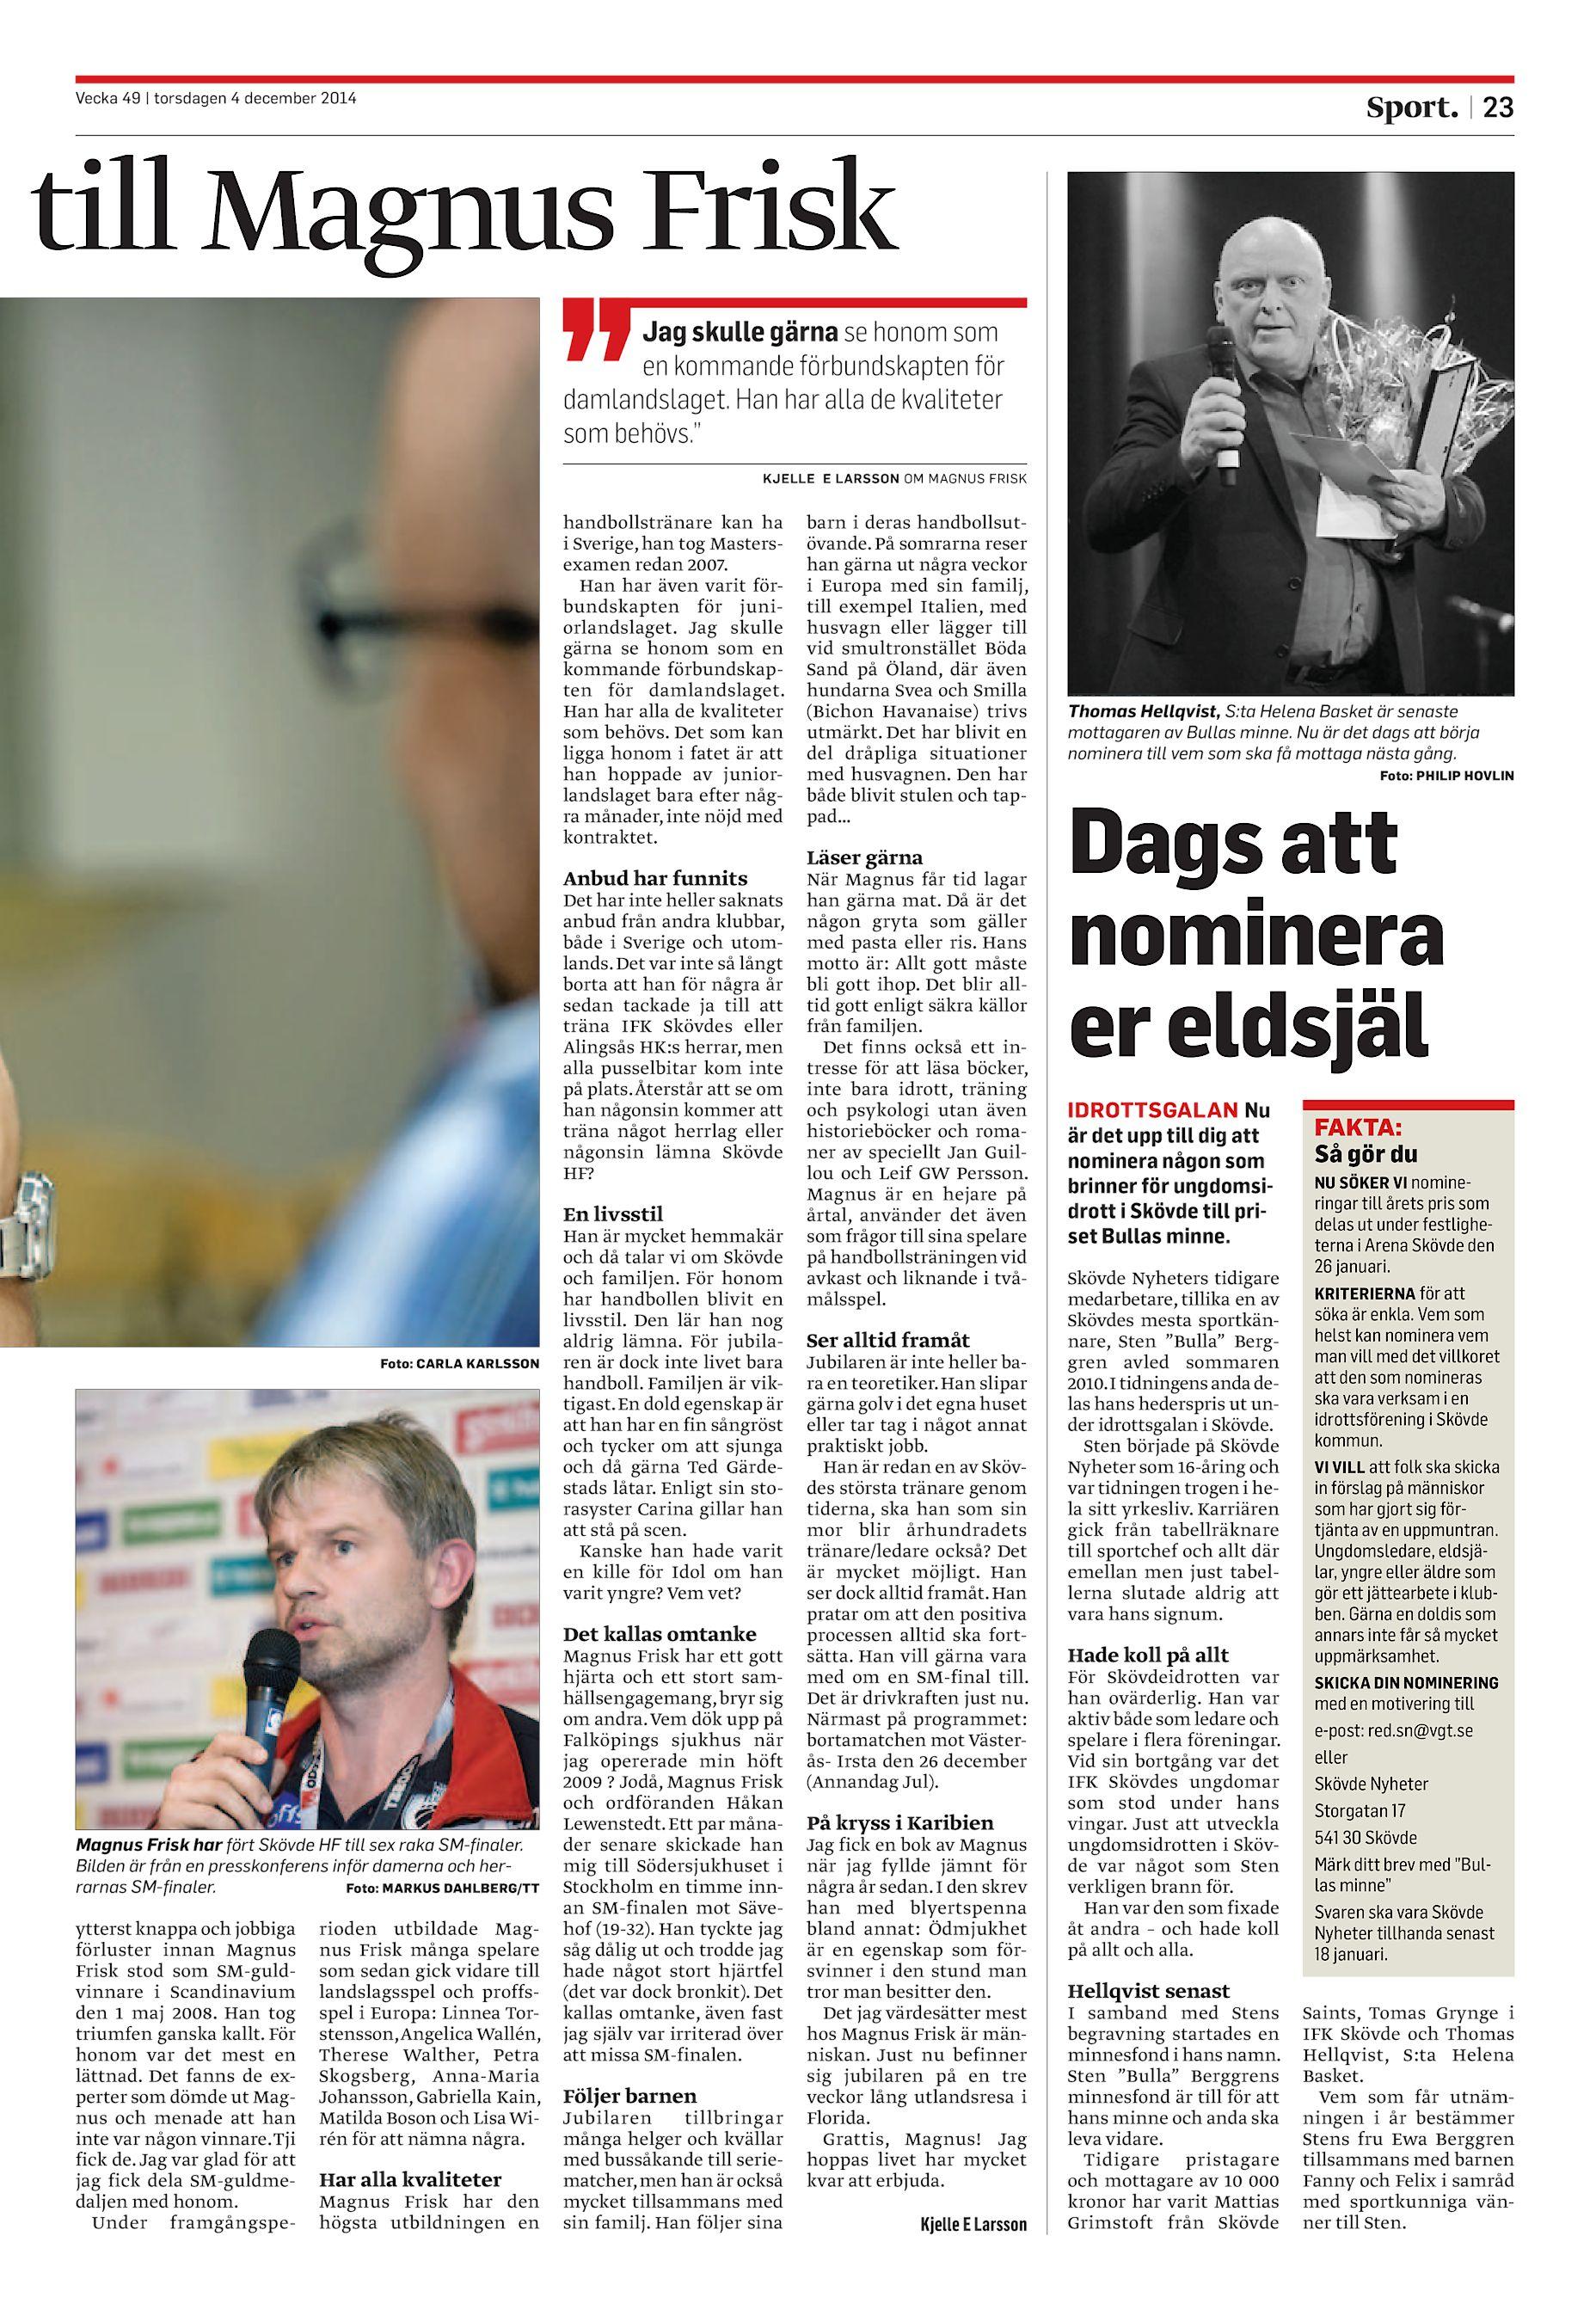 Skövde Nyheter SN-20141204 (endast text) 5fd3c77a000f6